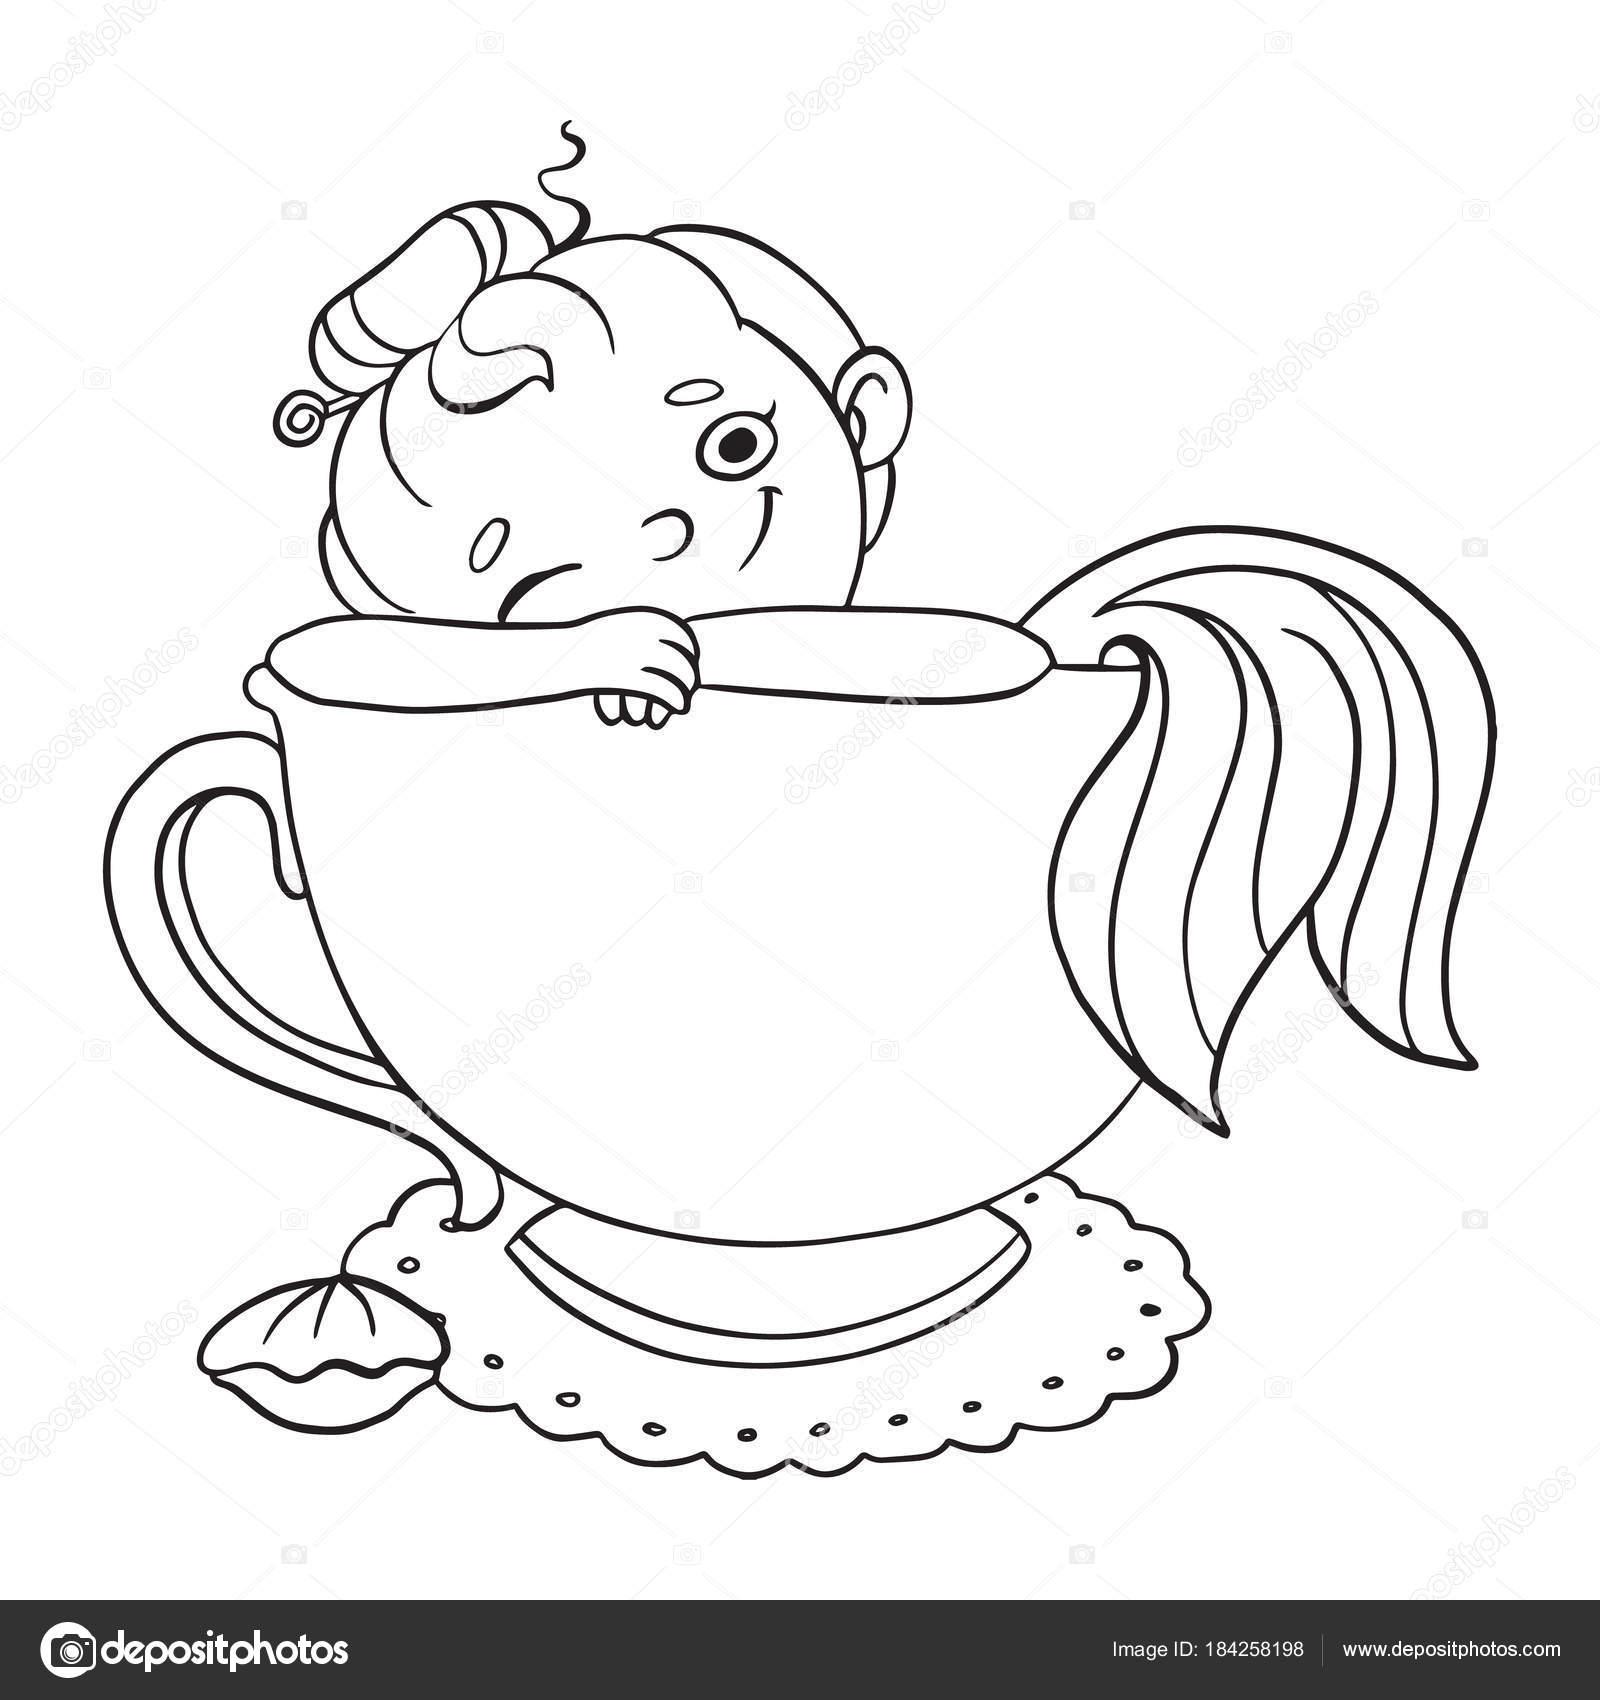 Funny Cartoon Mermaid In A Cup Of Tea Vector Contour Illustration